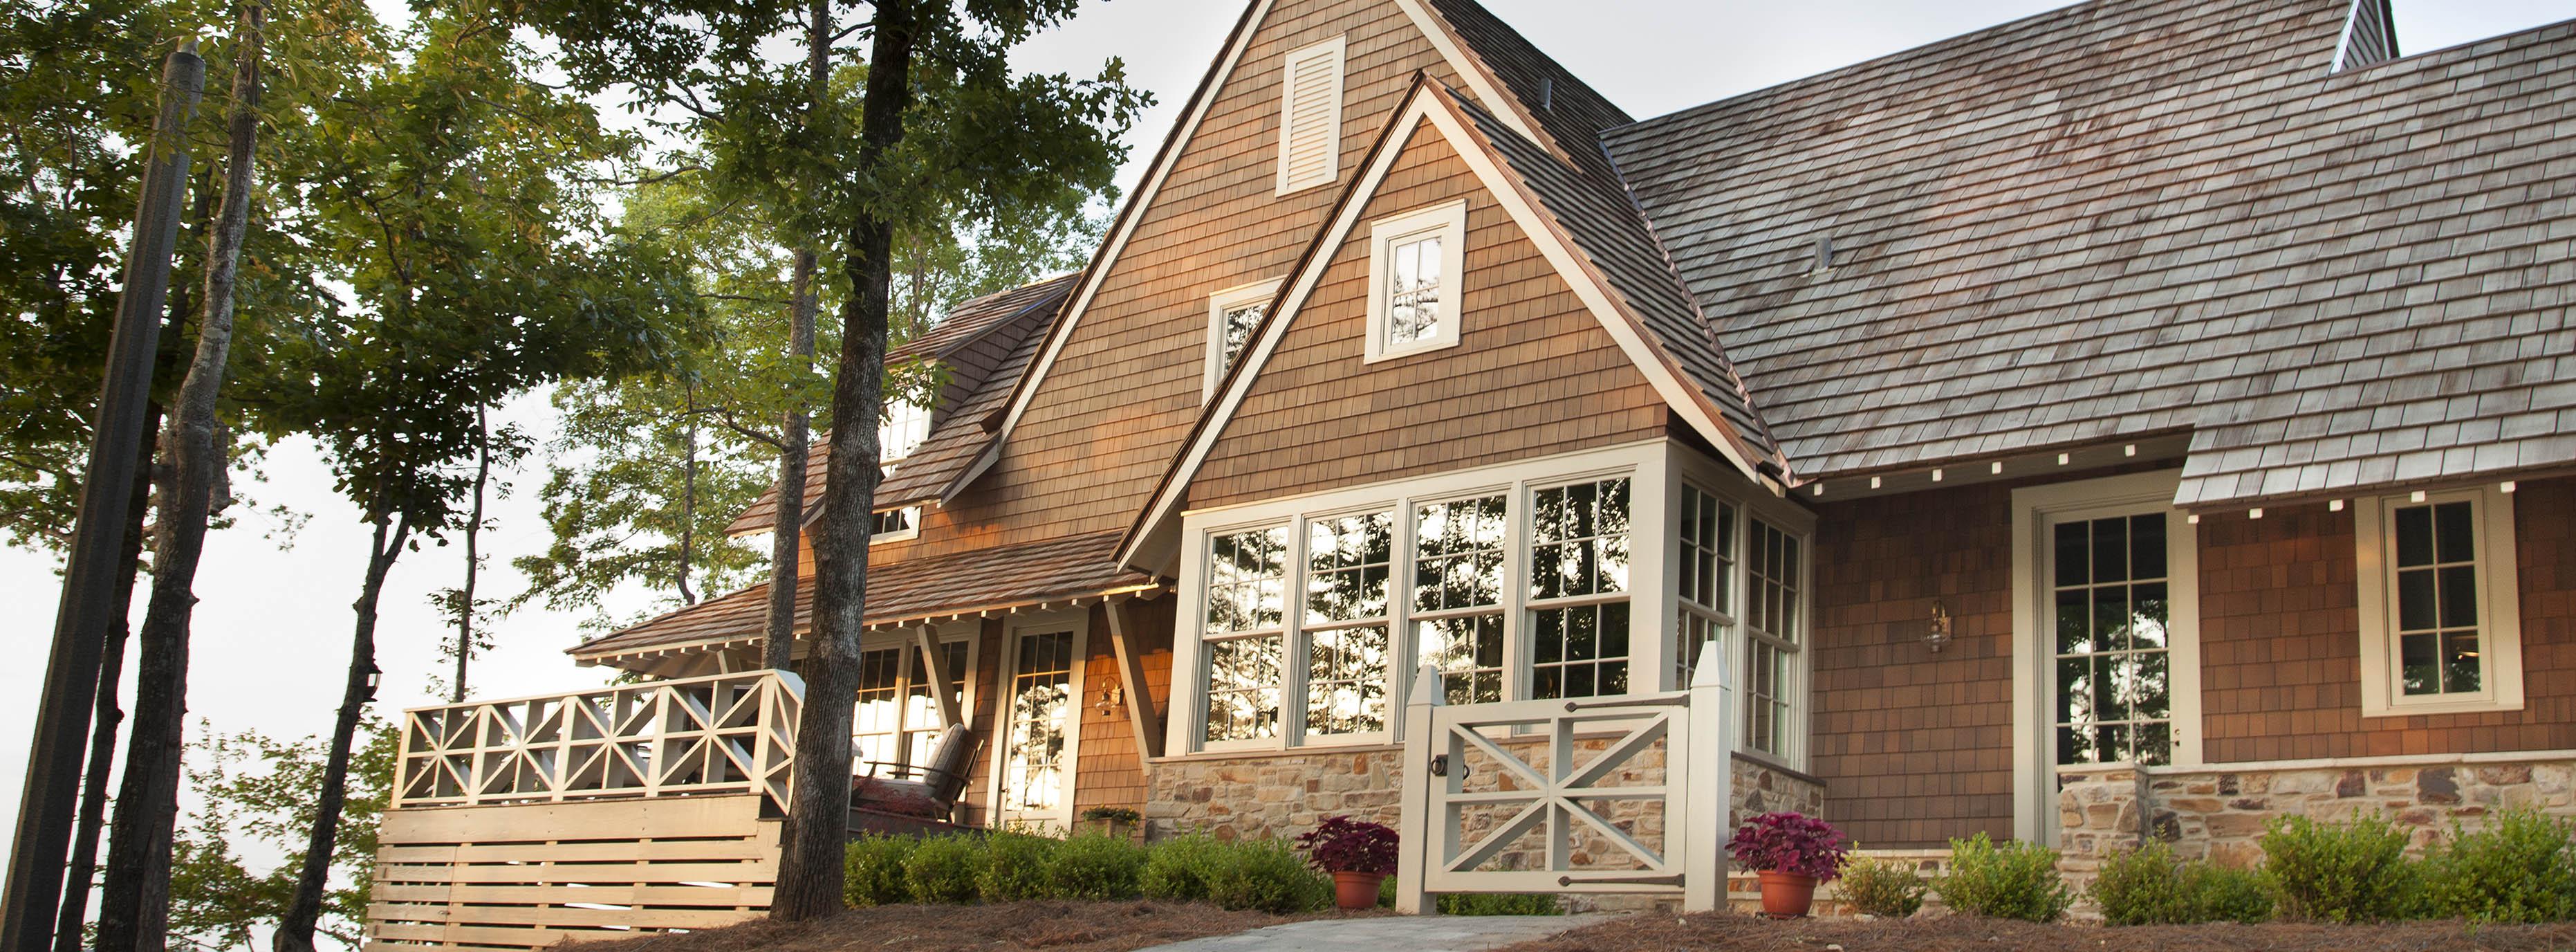 Attractive Shakertown Cedar Siding Cedar Shake Roofing Cedar Lap Siding Price Cedar Lap Siding Installation Instructions houzz-03 Cedar Lap Siding